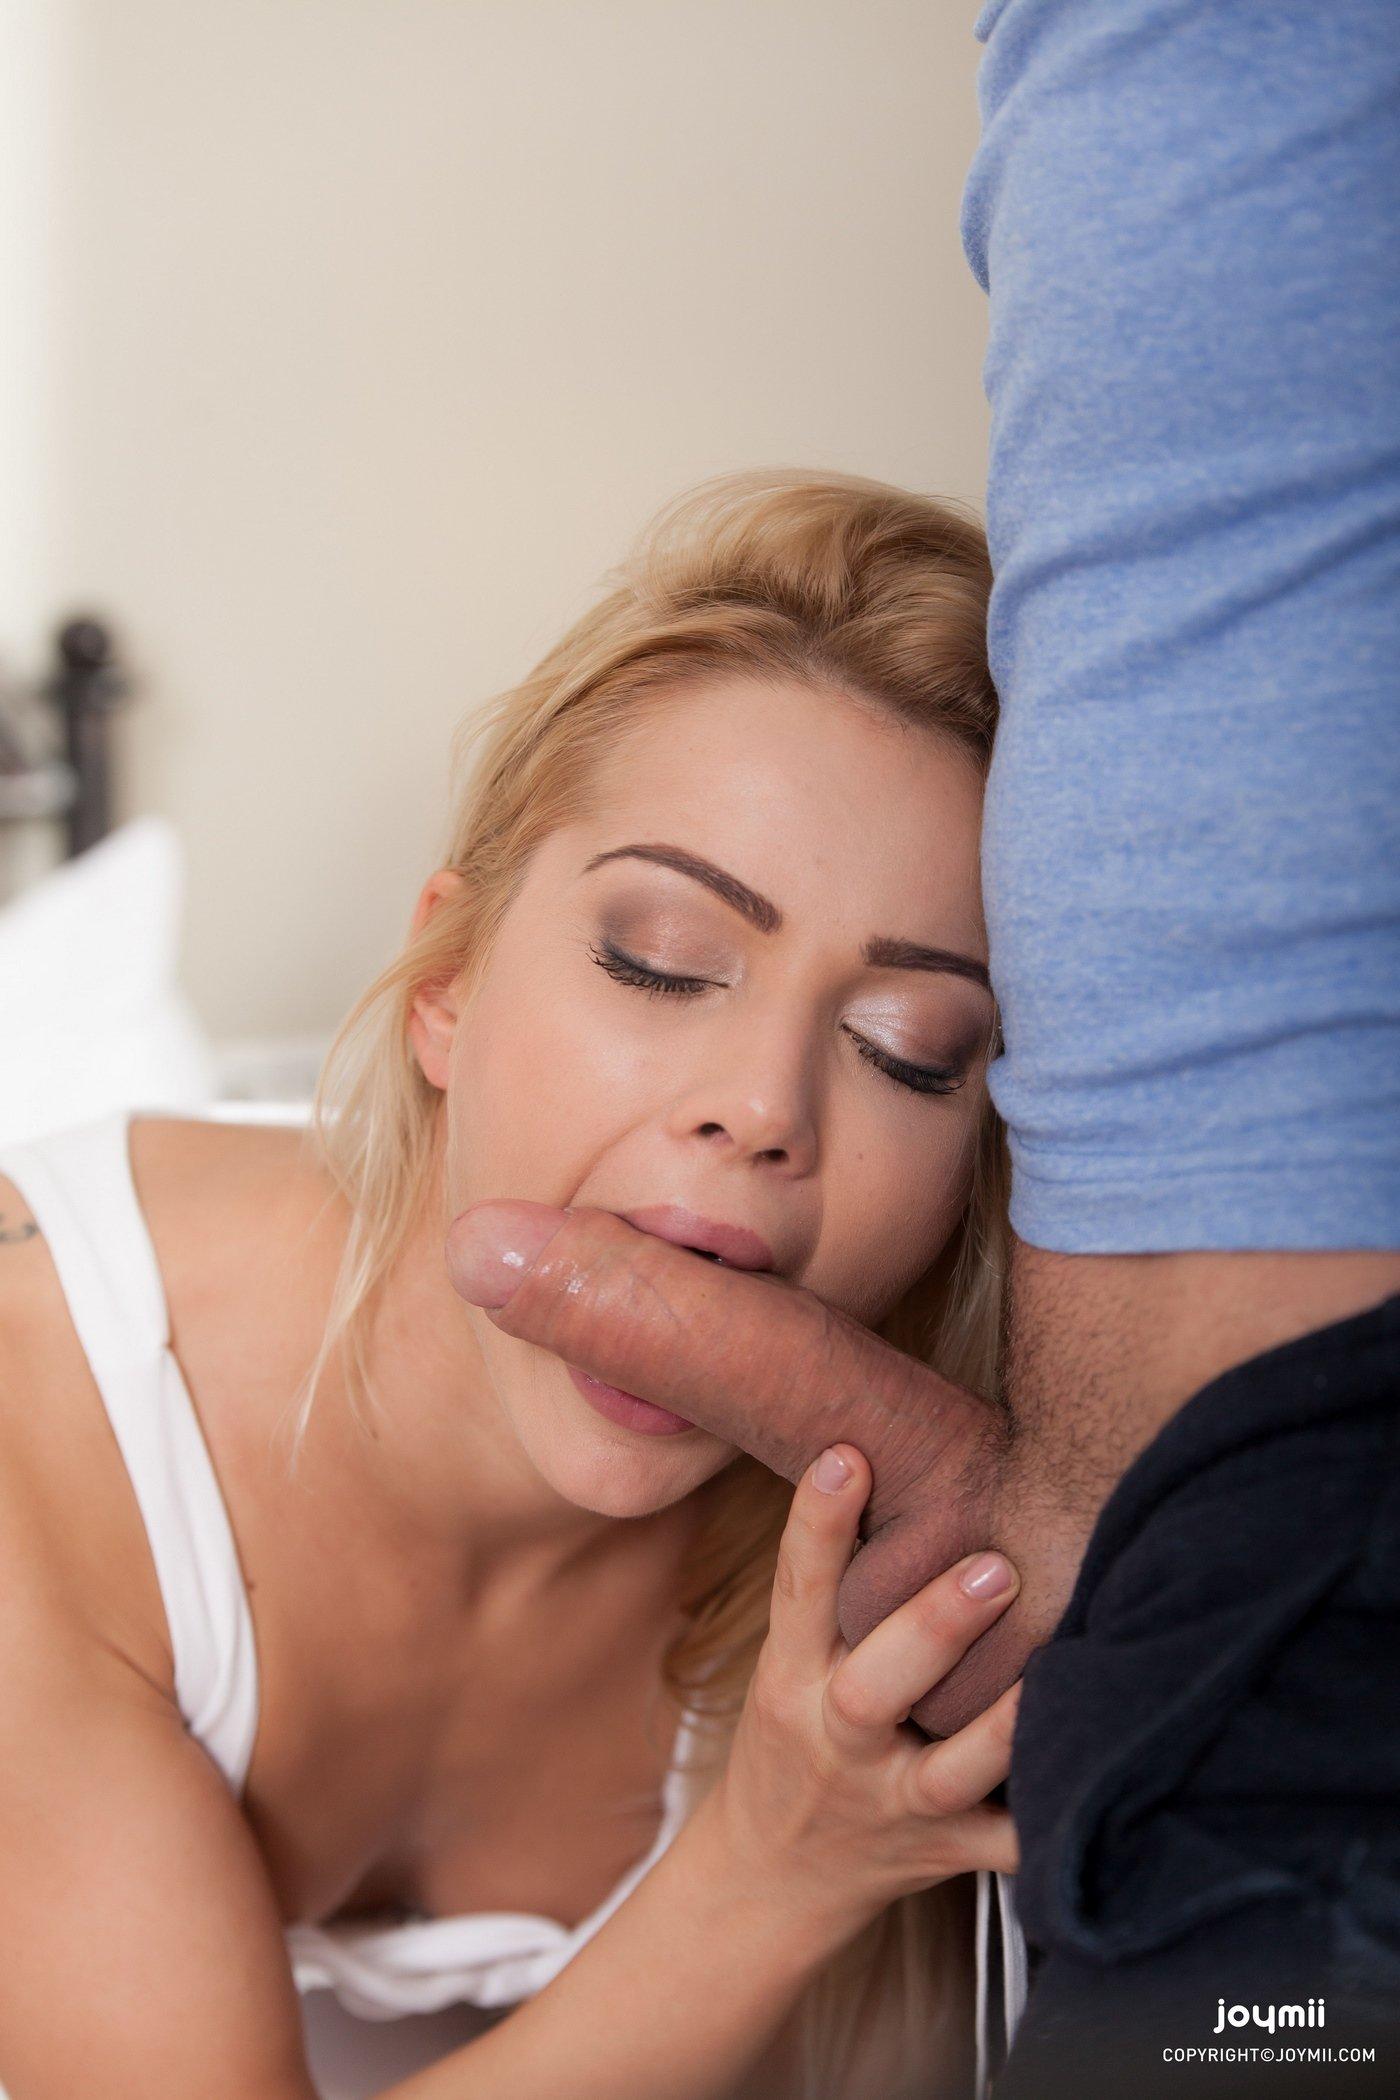 Девица Ласкает Клитор Во Время Секса